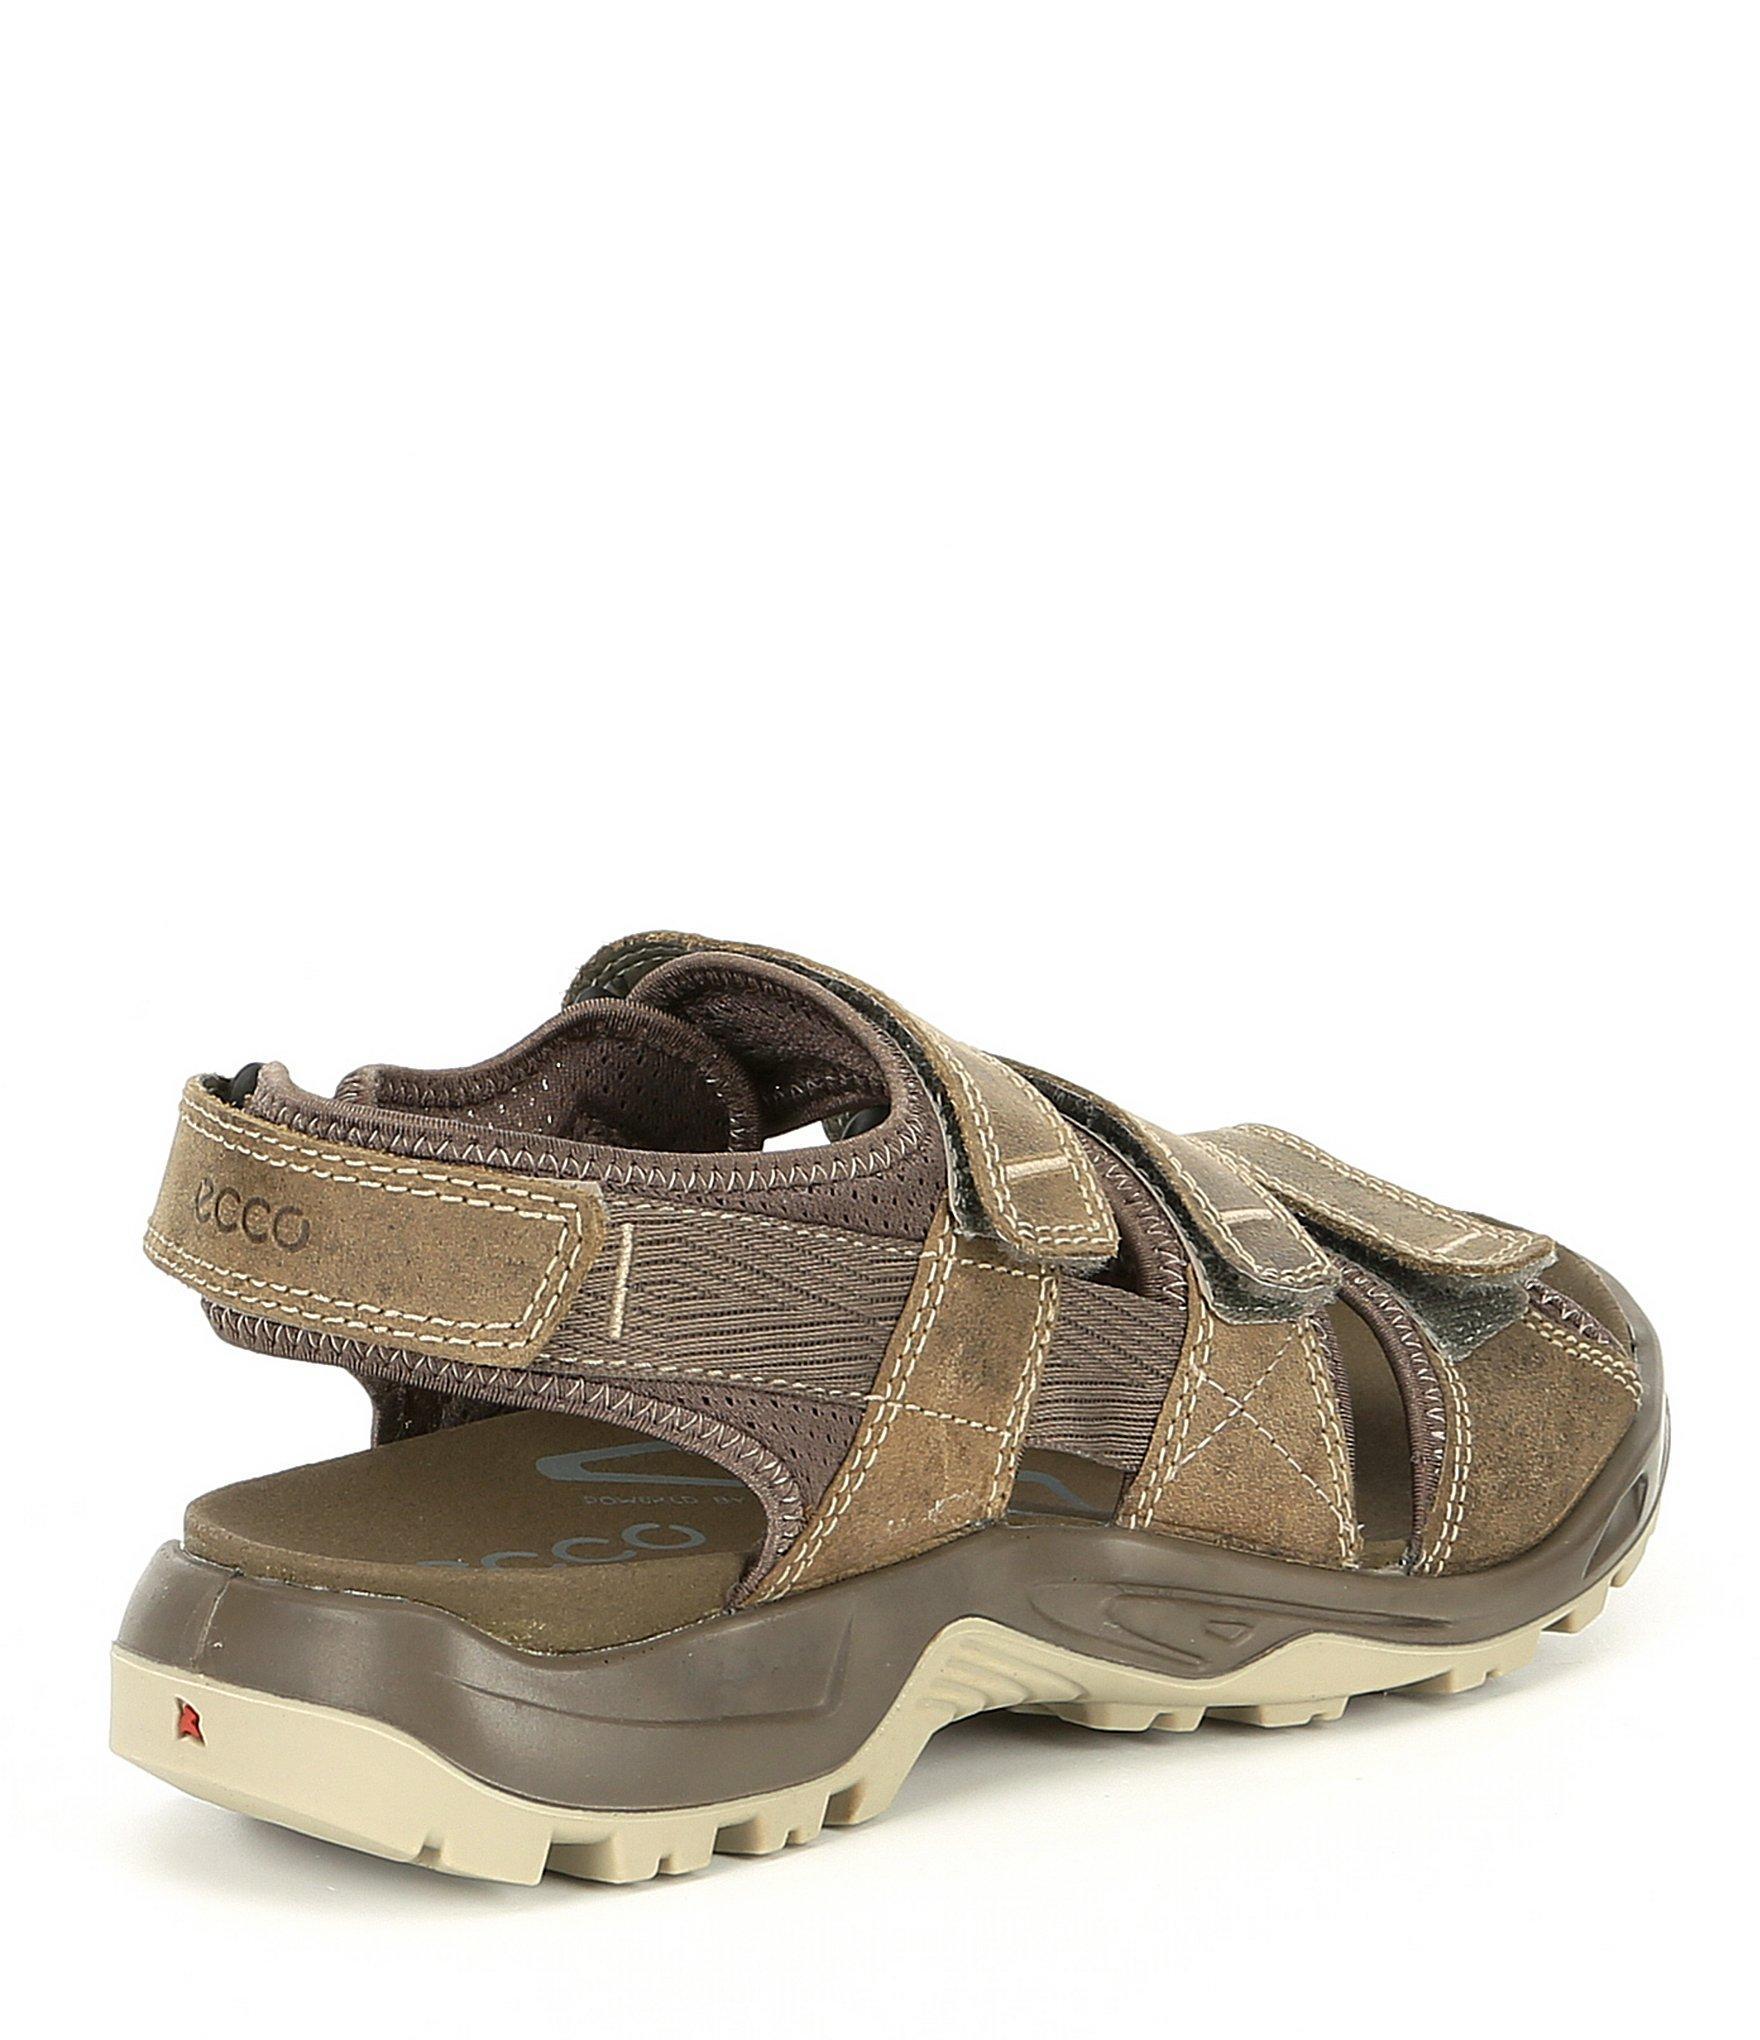 1ea48b7c6d6 Ecco - Brown Offroad Men's Leather Banded Sandal for Men - Lyst. View  fullscreen